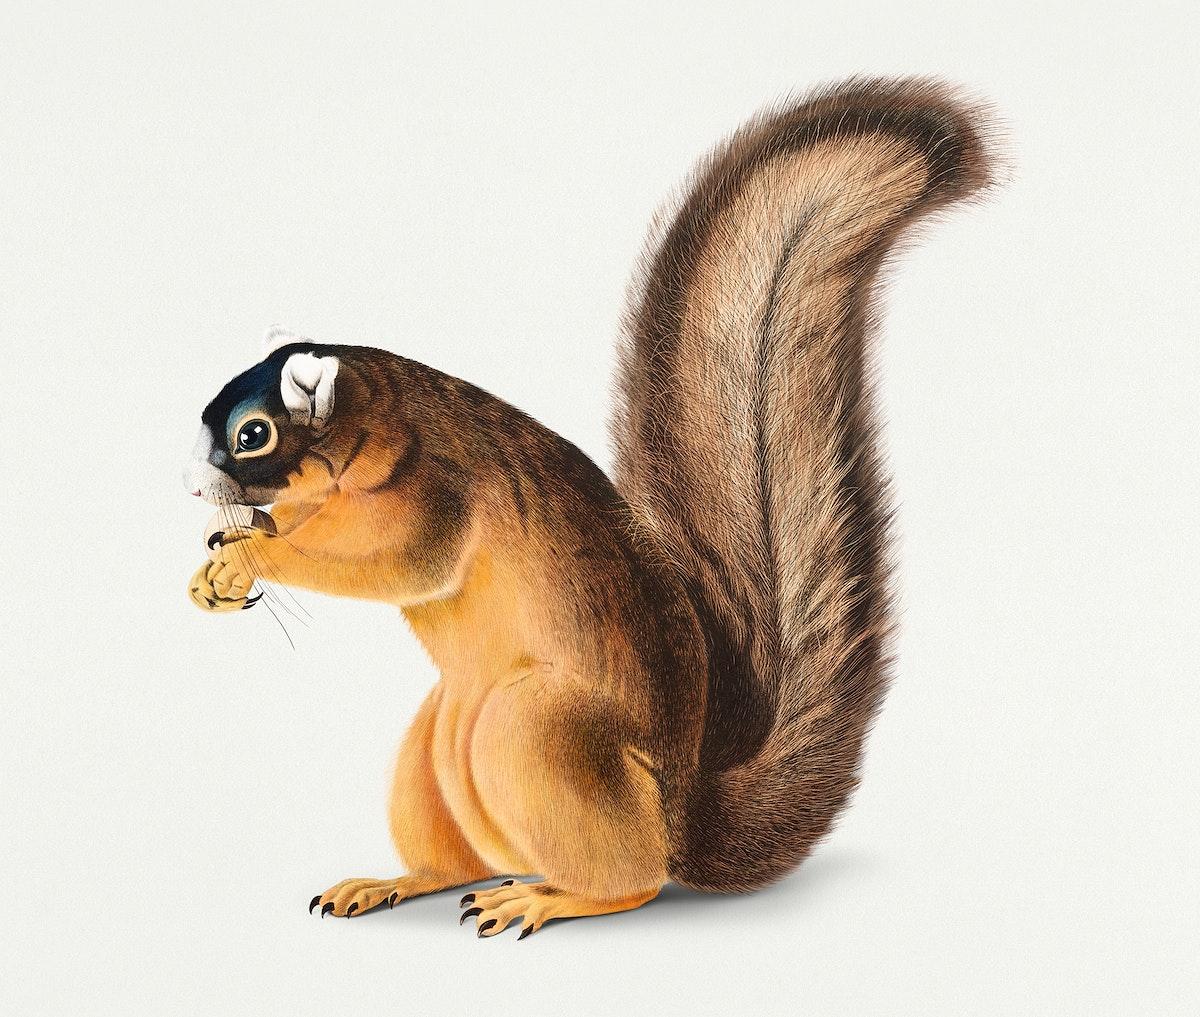 Vintage Illustration of Fox Squirrel.